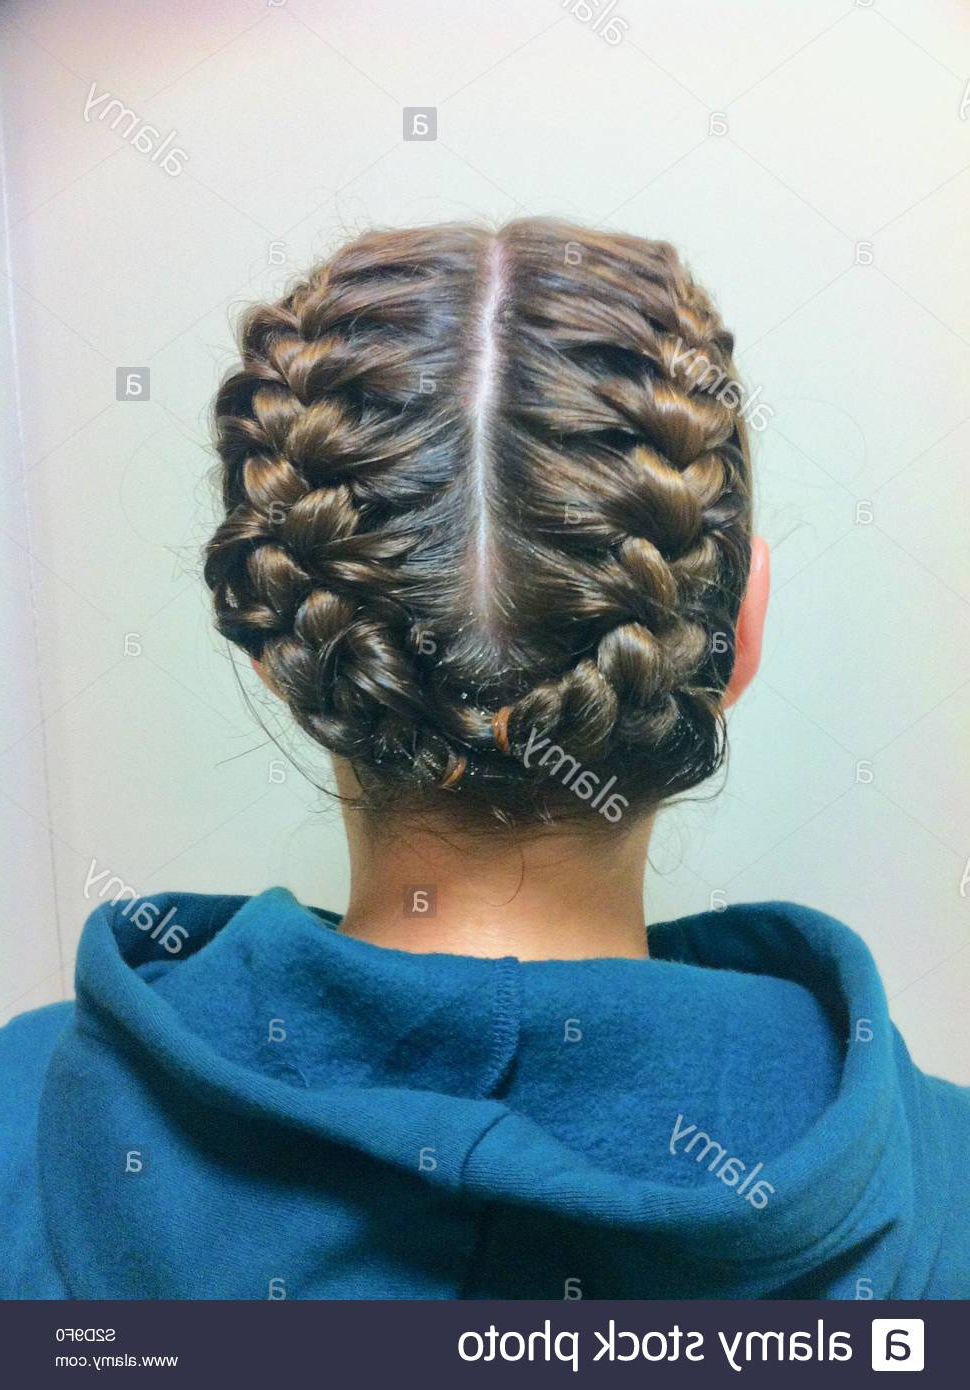 Braids Plaits Stock Photos & Braids Plaits Stock Images – Alamy Pertaining To Favorite Renaissance Micro Braid Hairstyles (View 18 of 20)